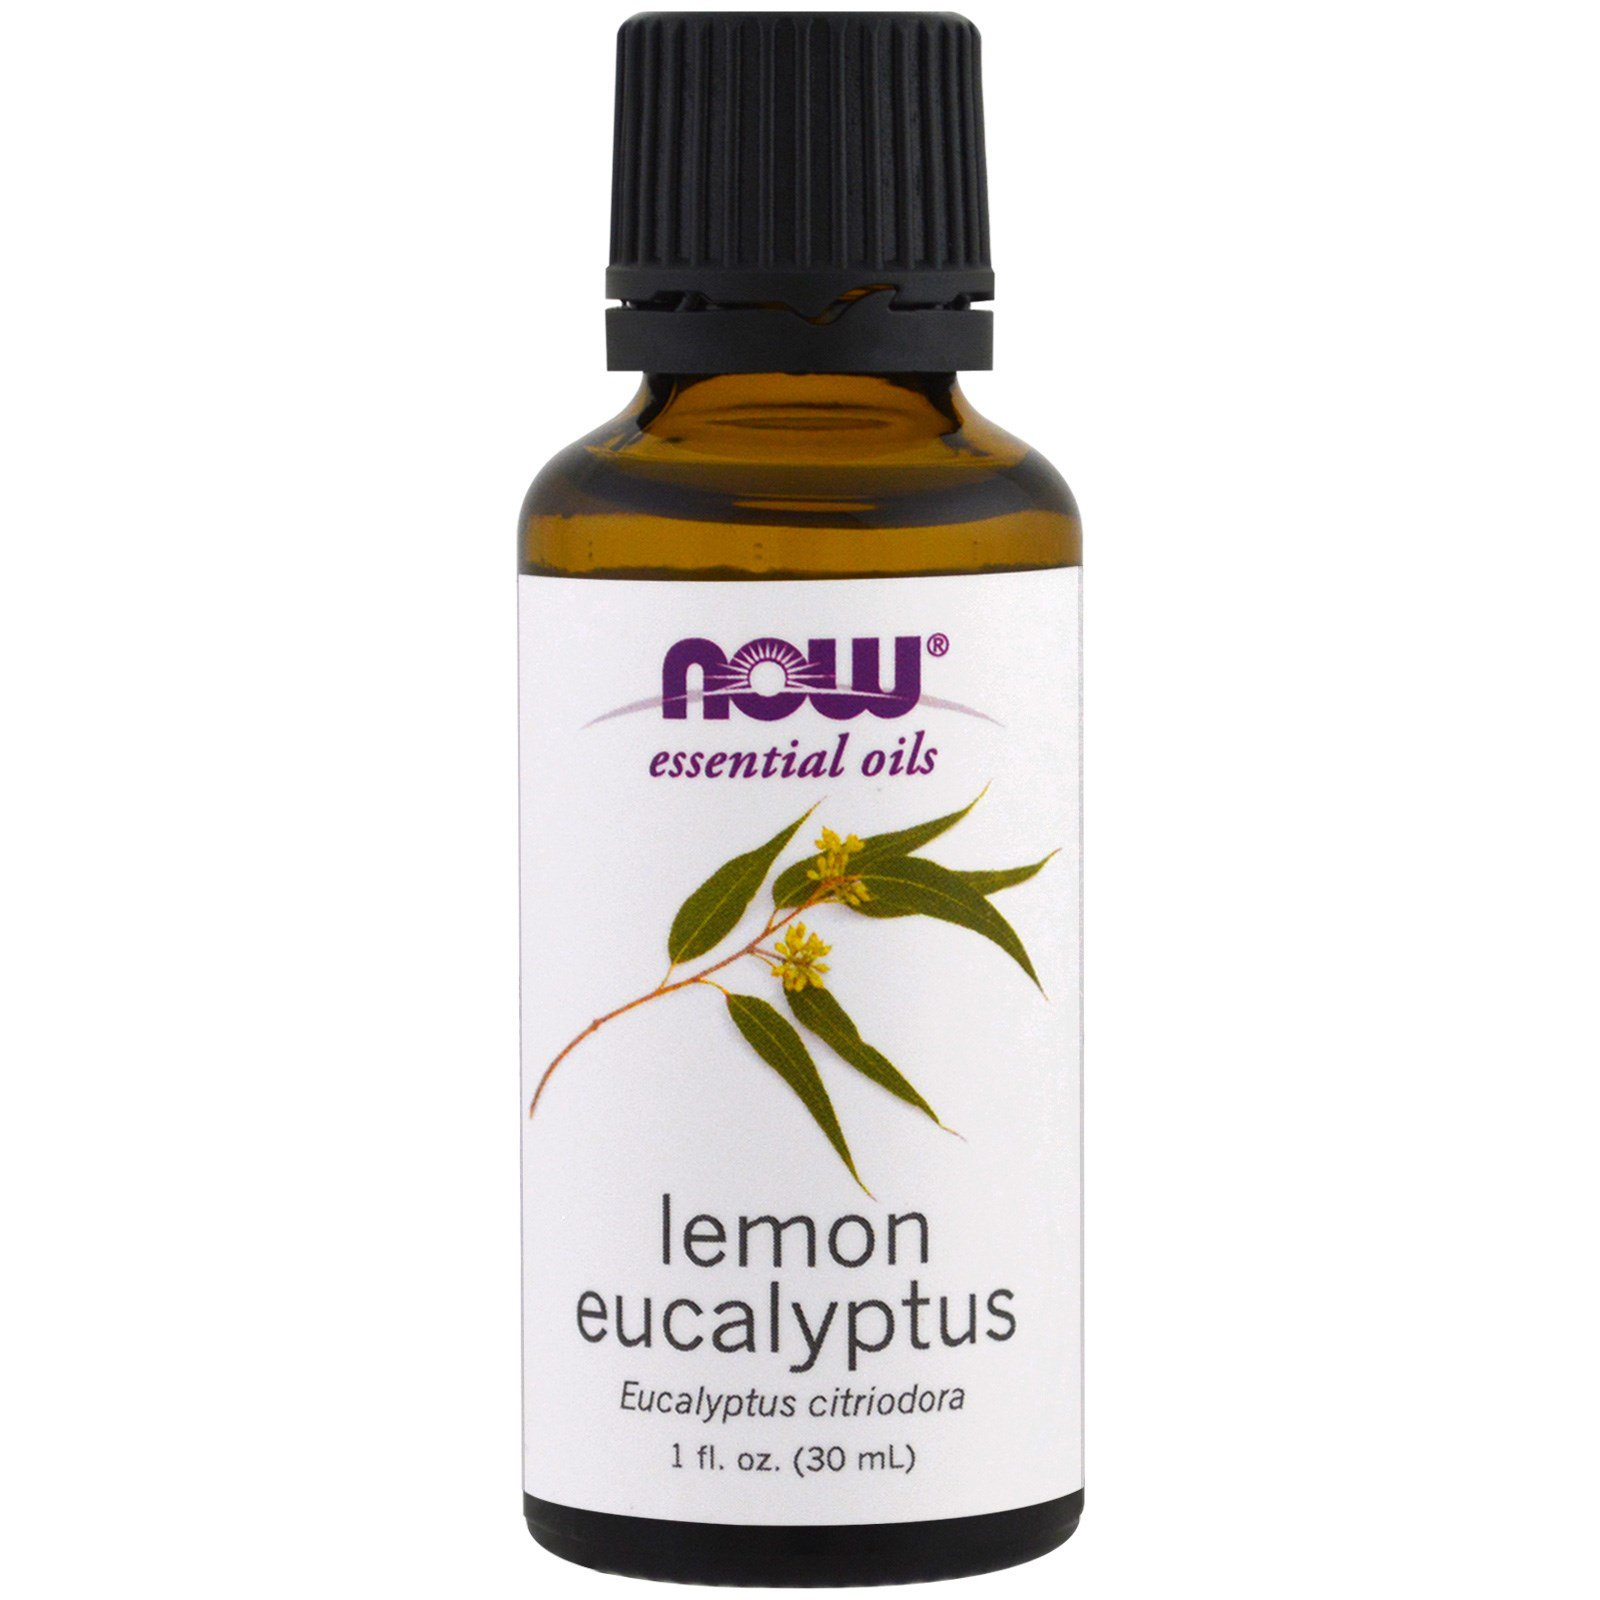 Image of Essential Oils- Lemon Eucalyptus (30 ml) - Now Foods 0733739076380